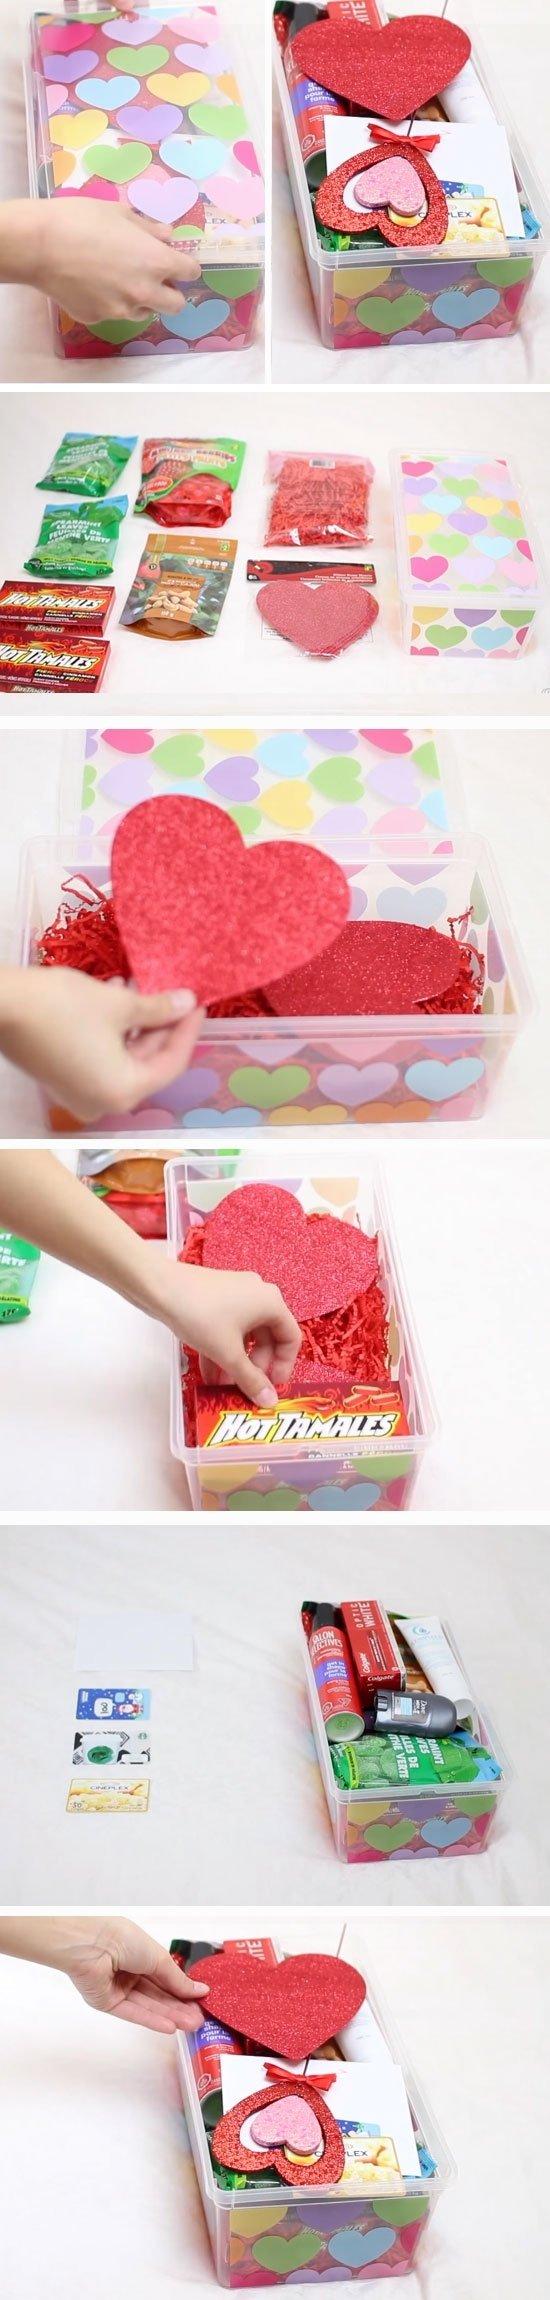 10 Amazing Valentine Craft Ideas For Him 25 romantic diy valentines day crafts for him 1 2020